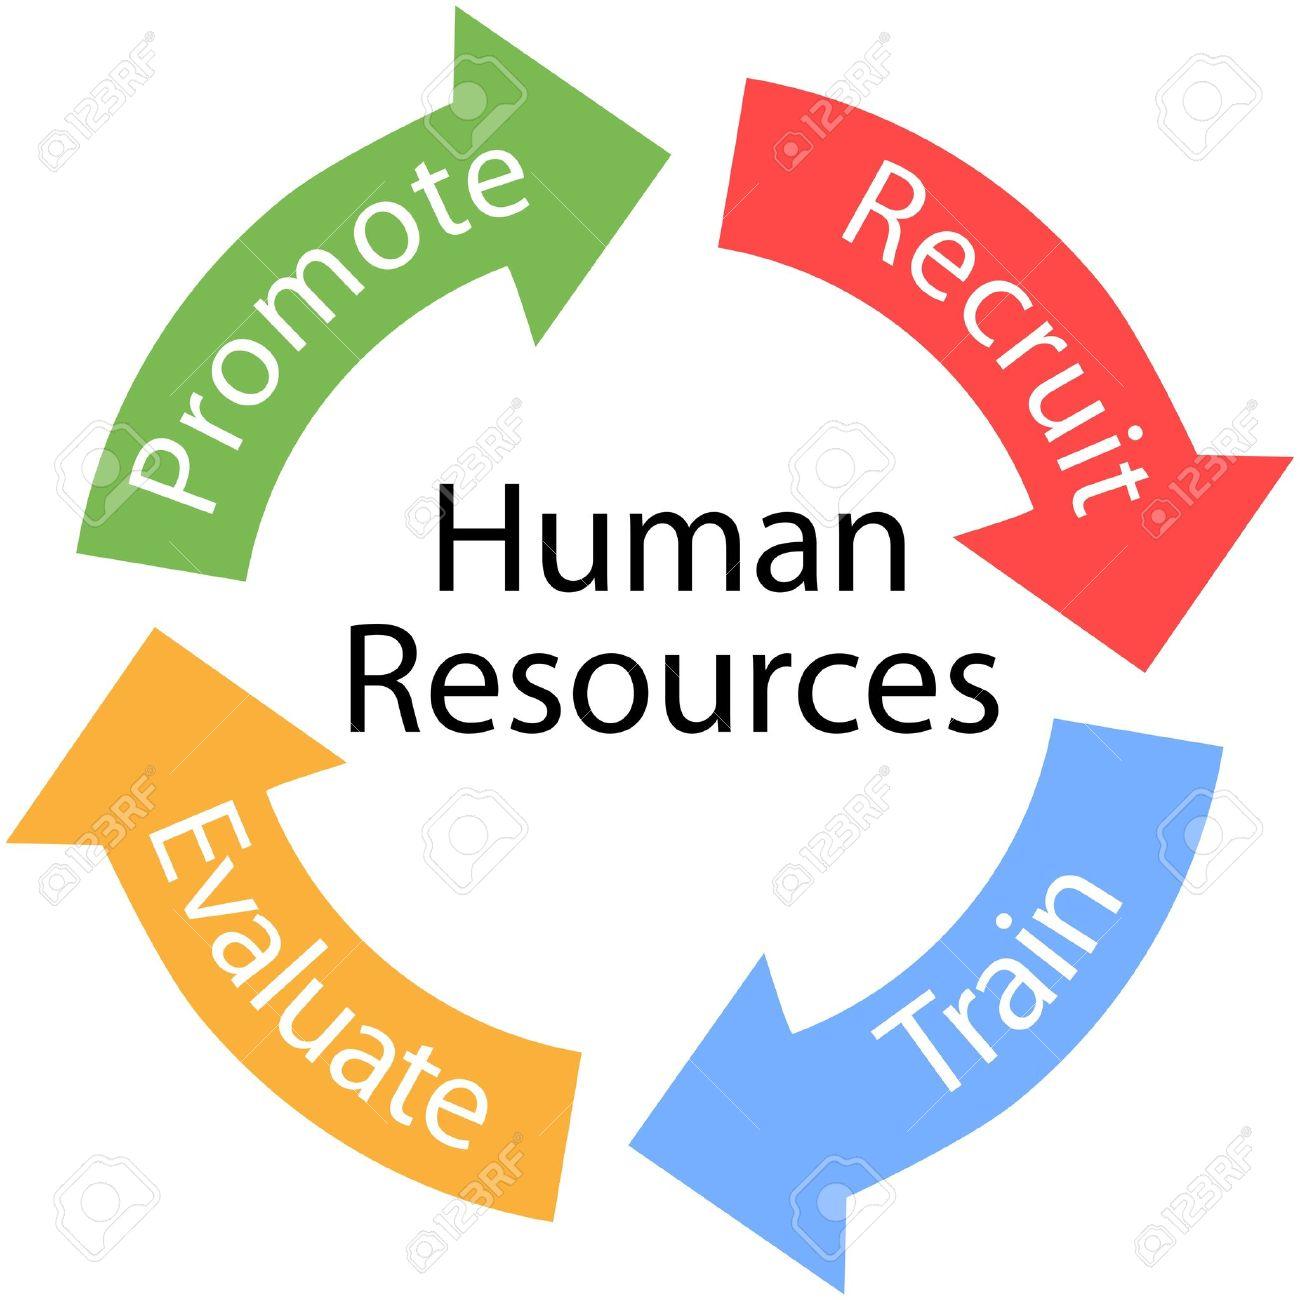 Enterprise Human Resources Arrows Are The Recruit Train Evaluate.